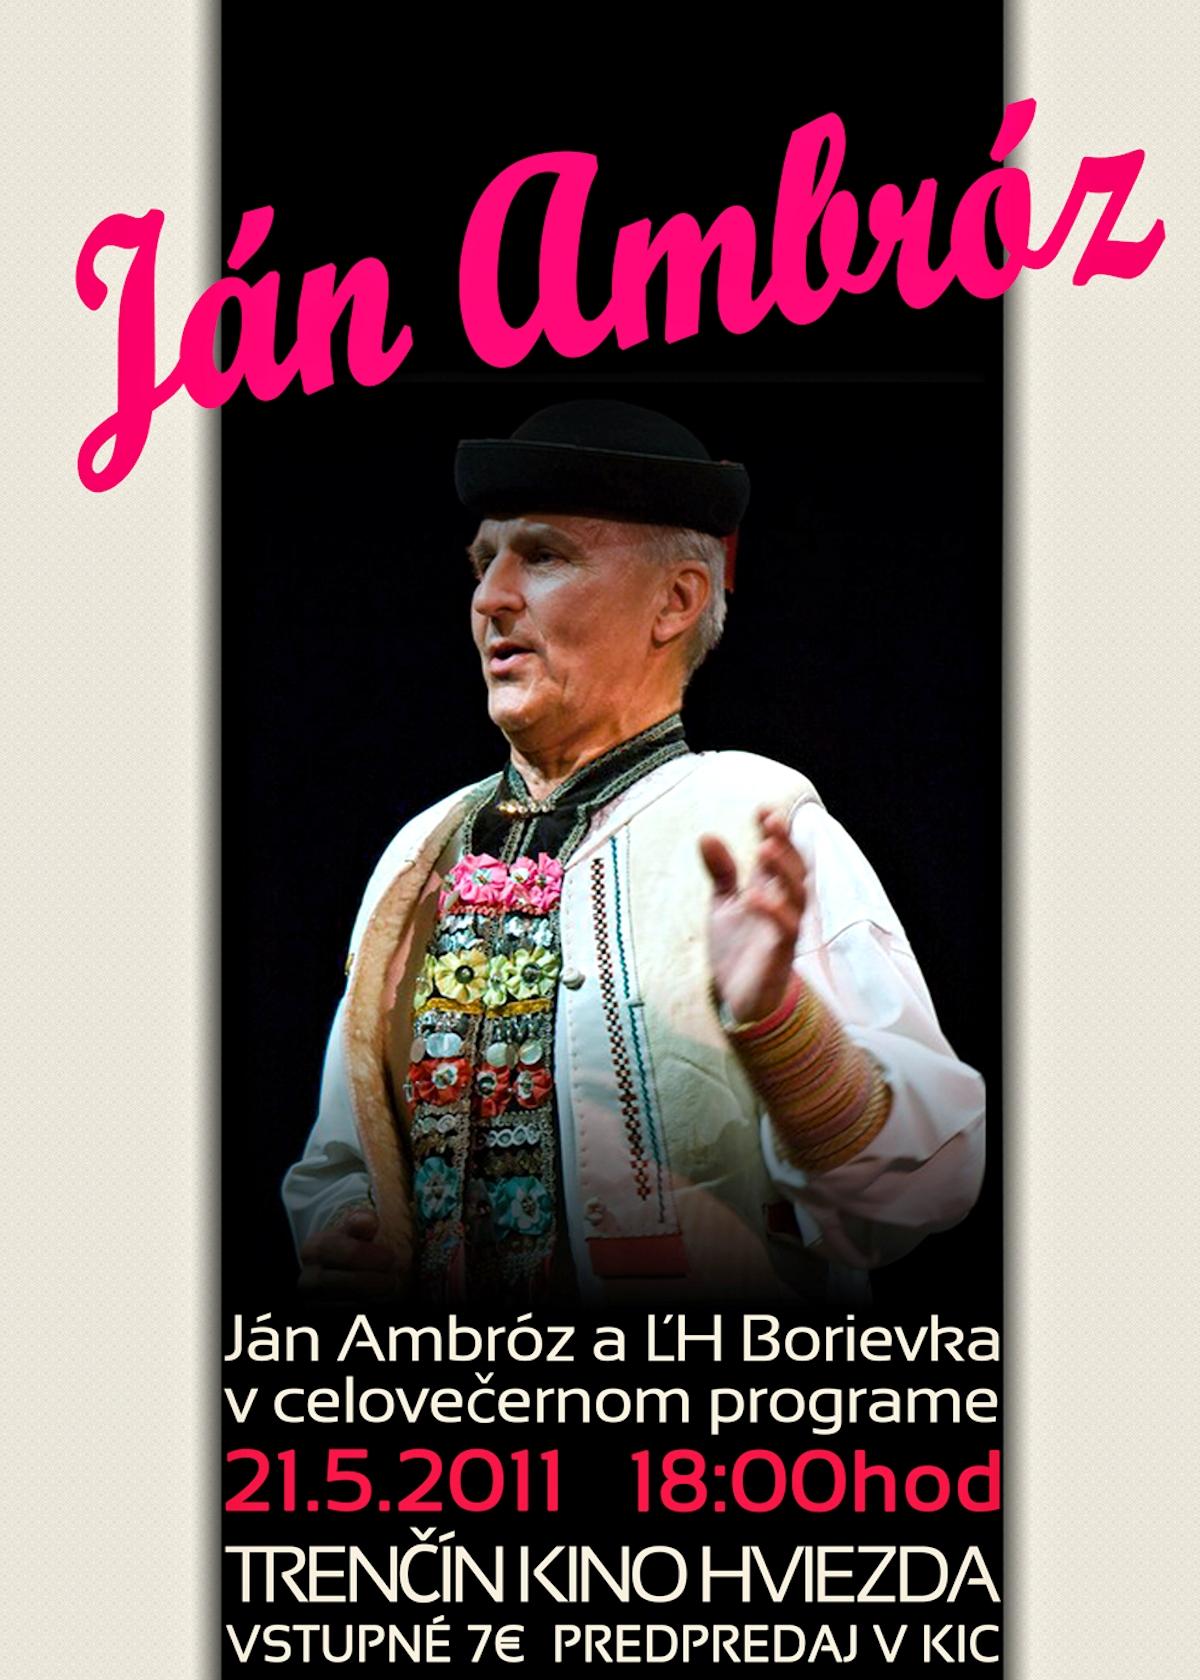 00 Jan Ambroz. Slovakia. 20.12.14